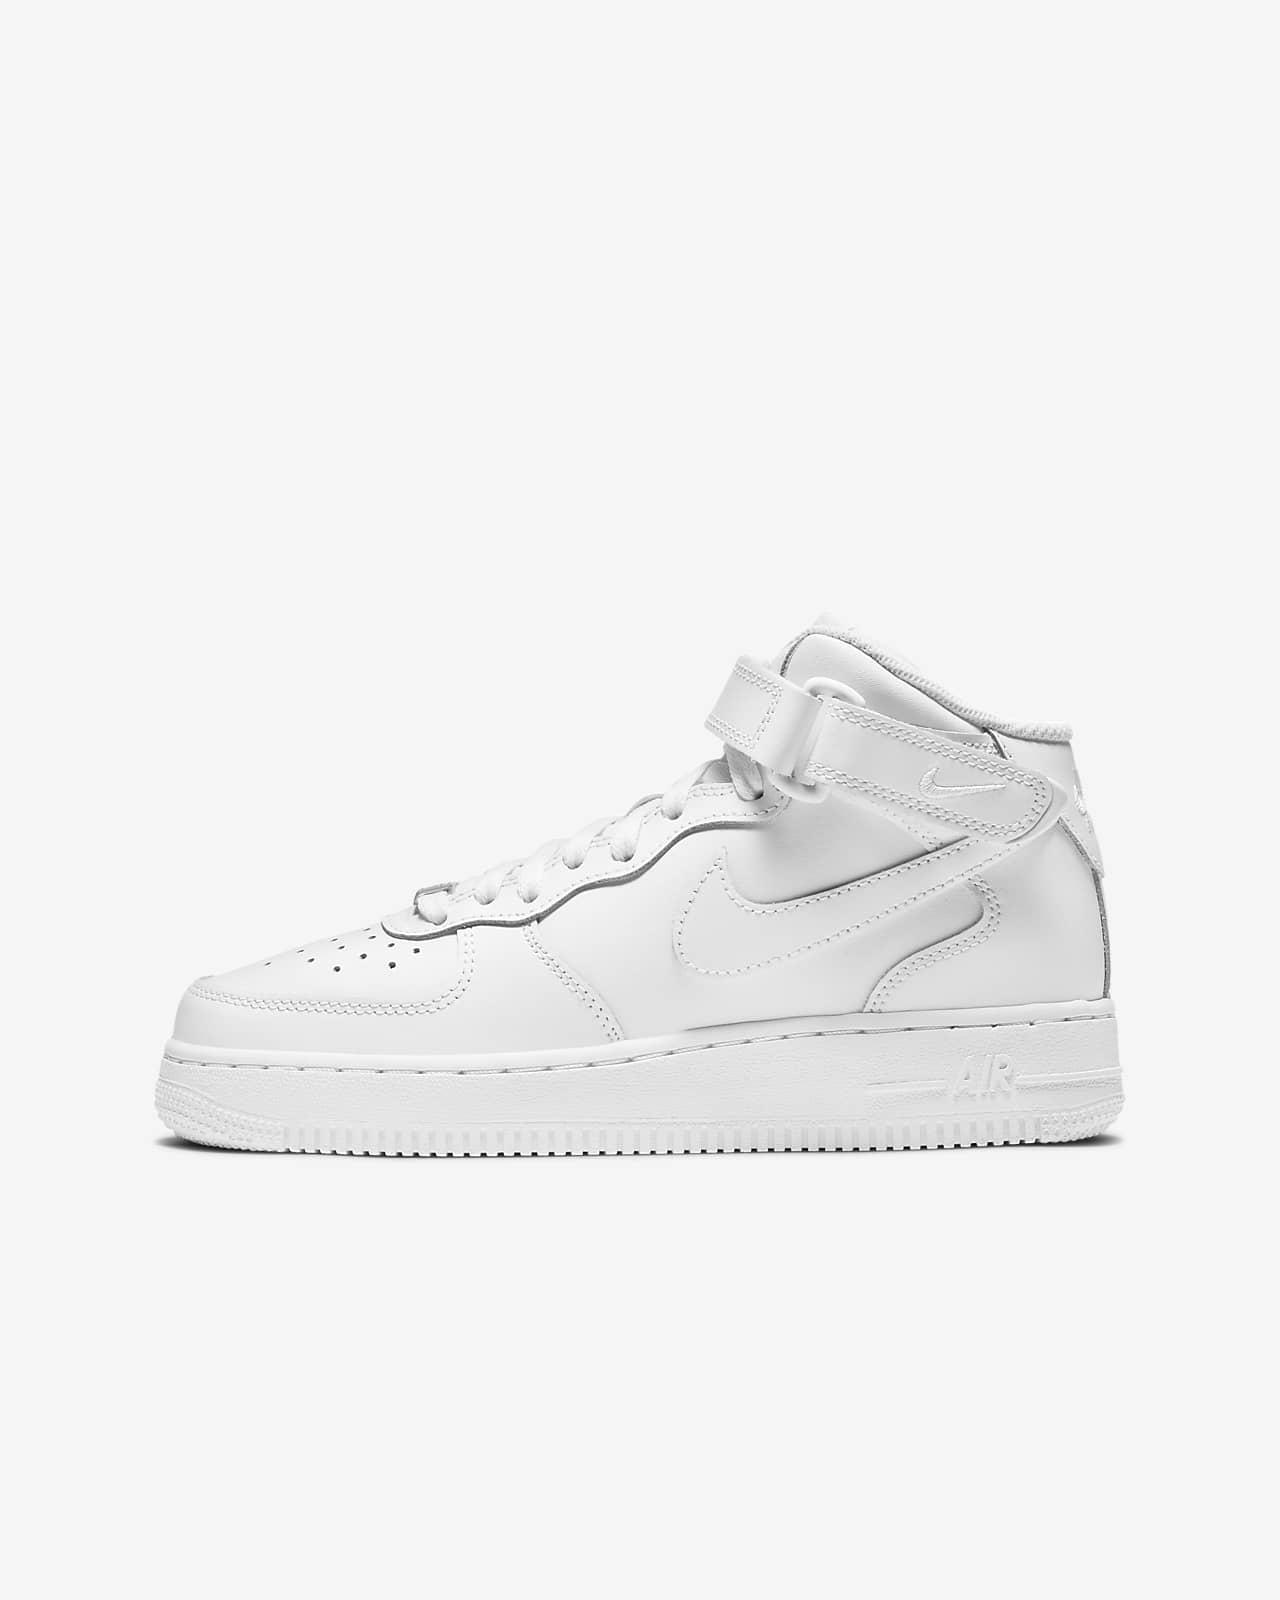 Nike Air Force 1 Mid LE Older Kids' Shoes. Nike LU